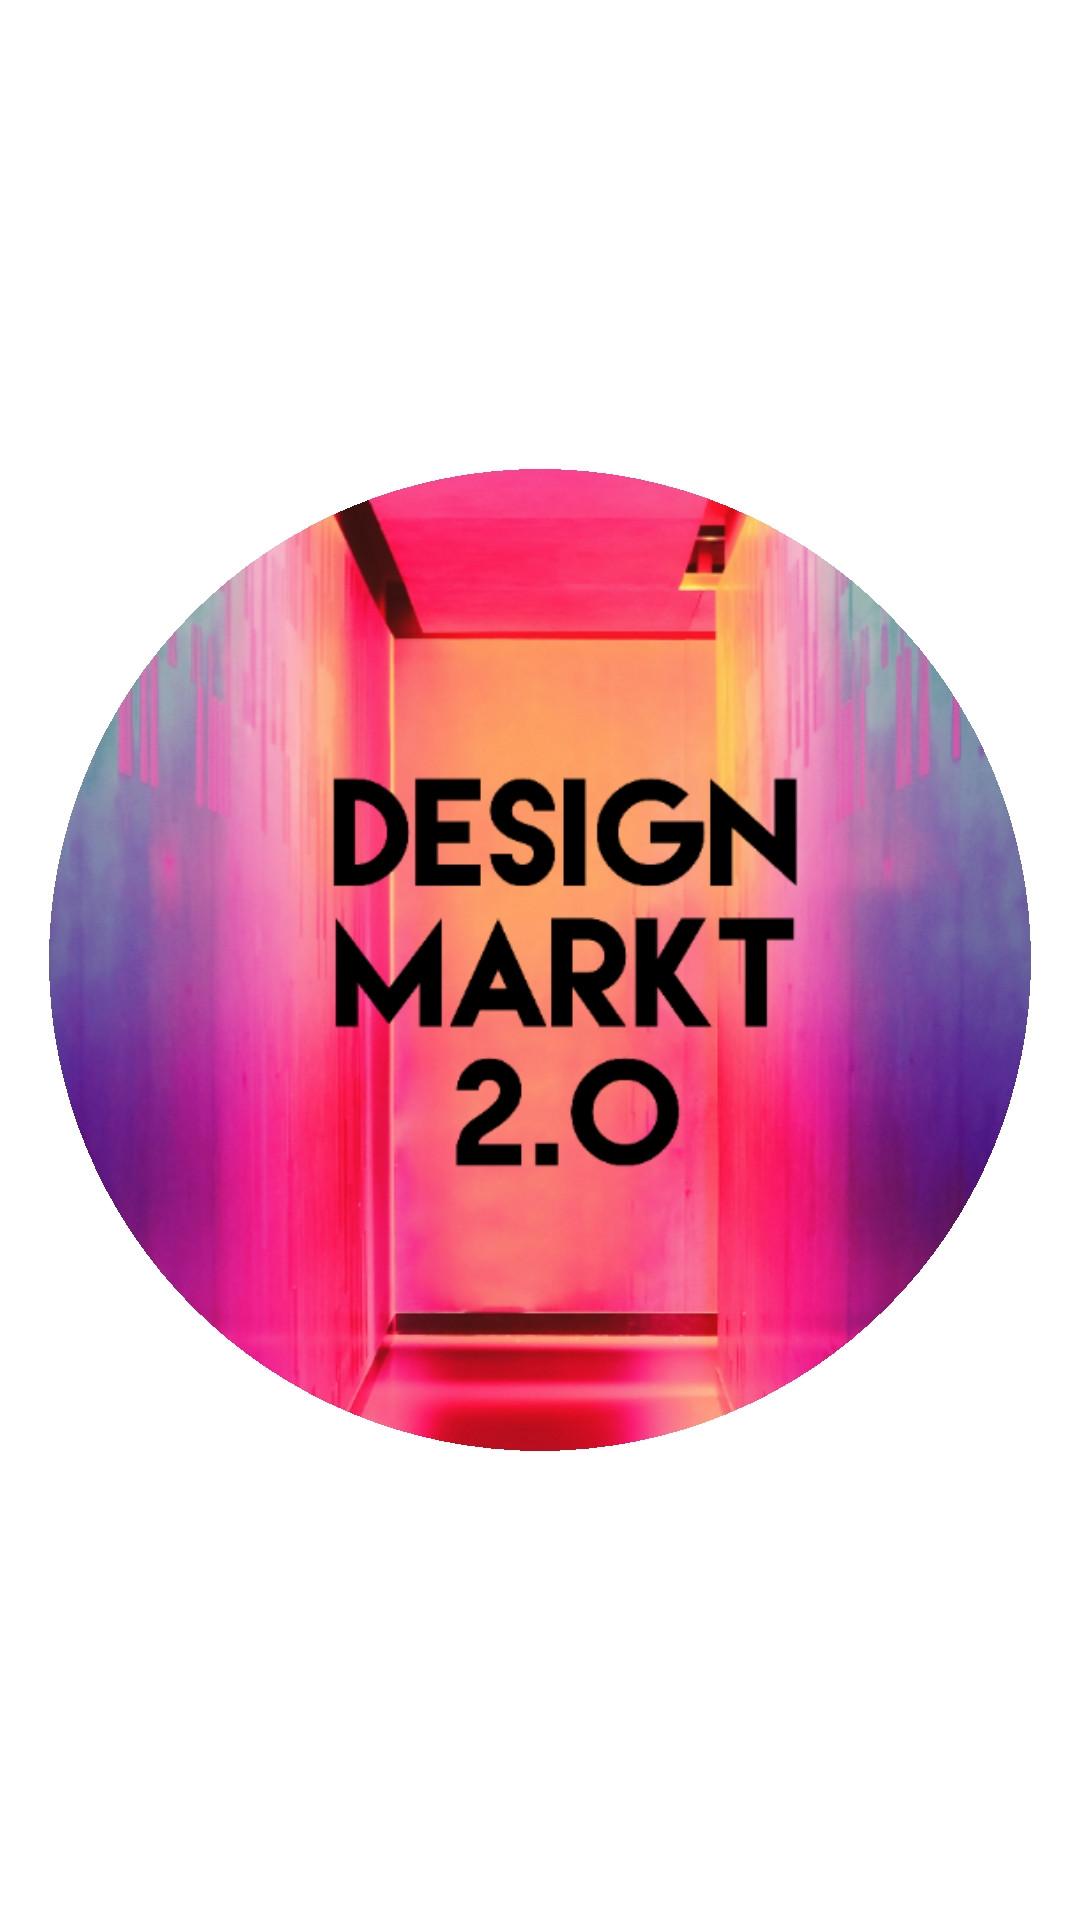 Small Paket, Designmarkt